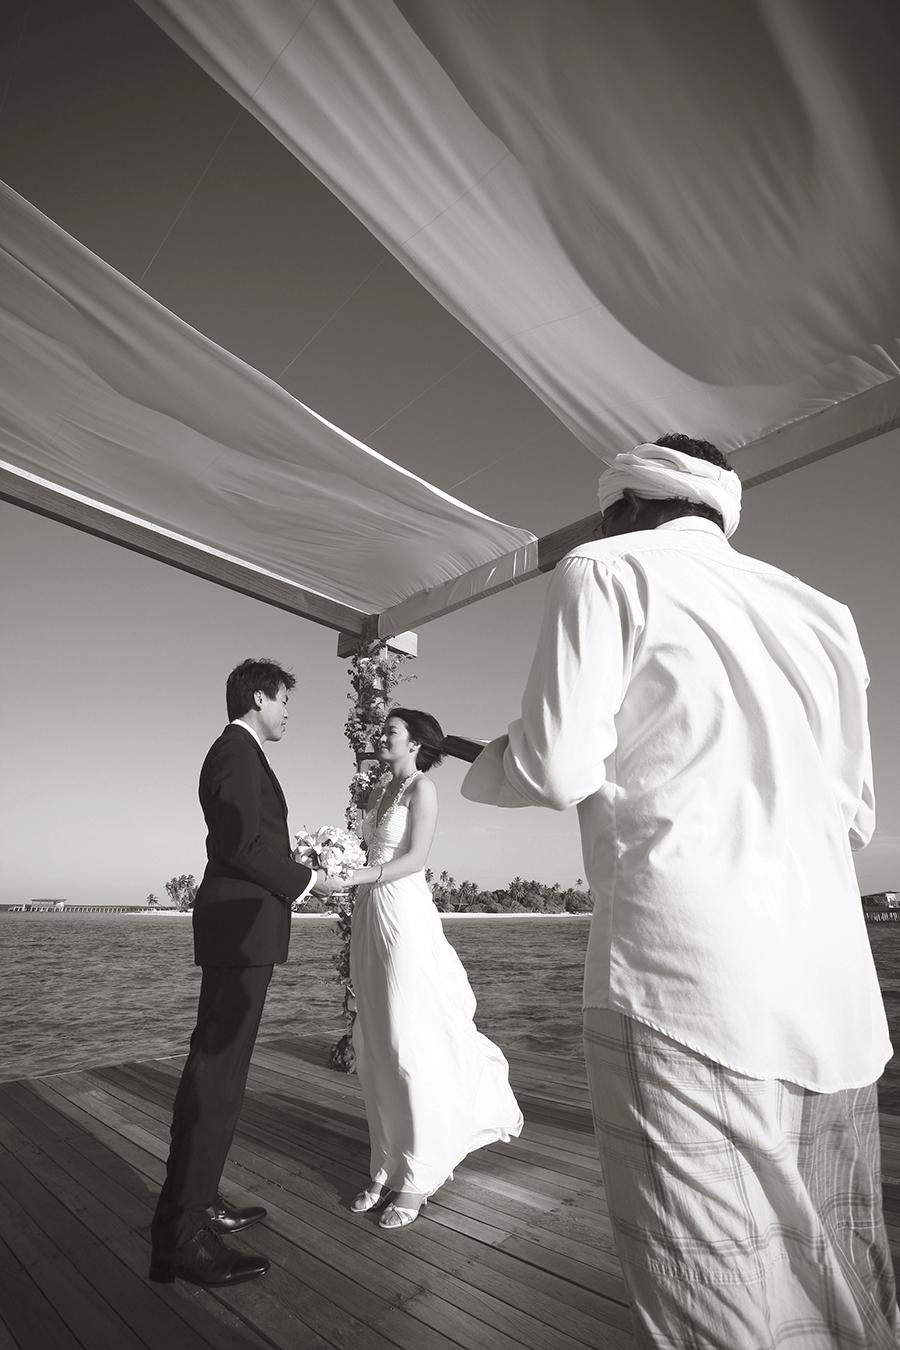 maldives . mauritius . tahiti . wedding photography by kurt ahs . 5393.jpg